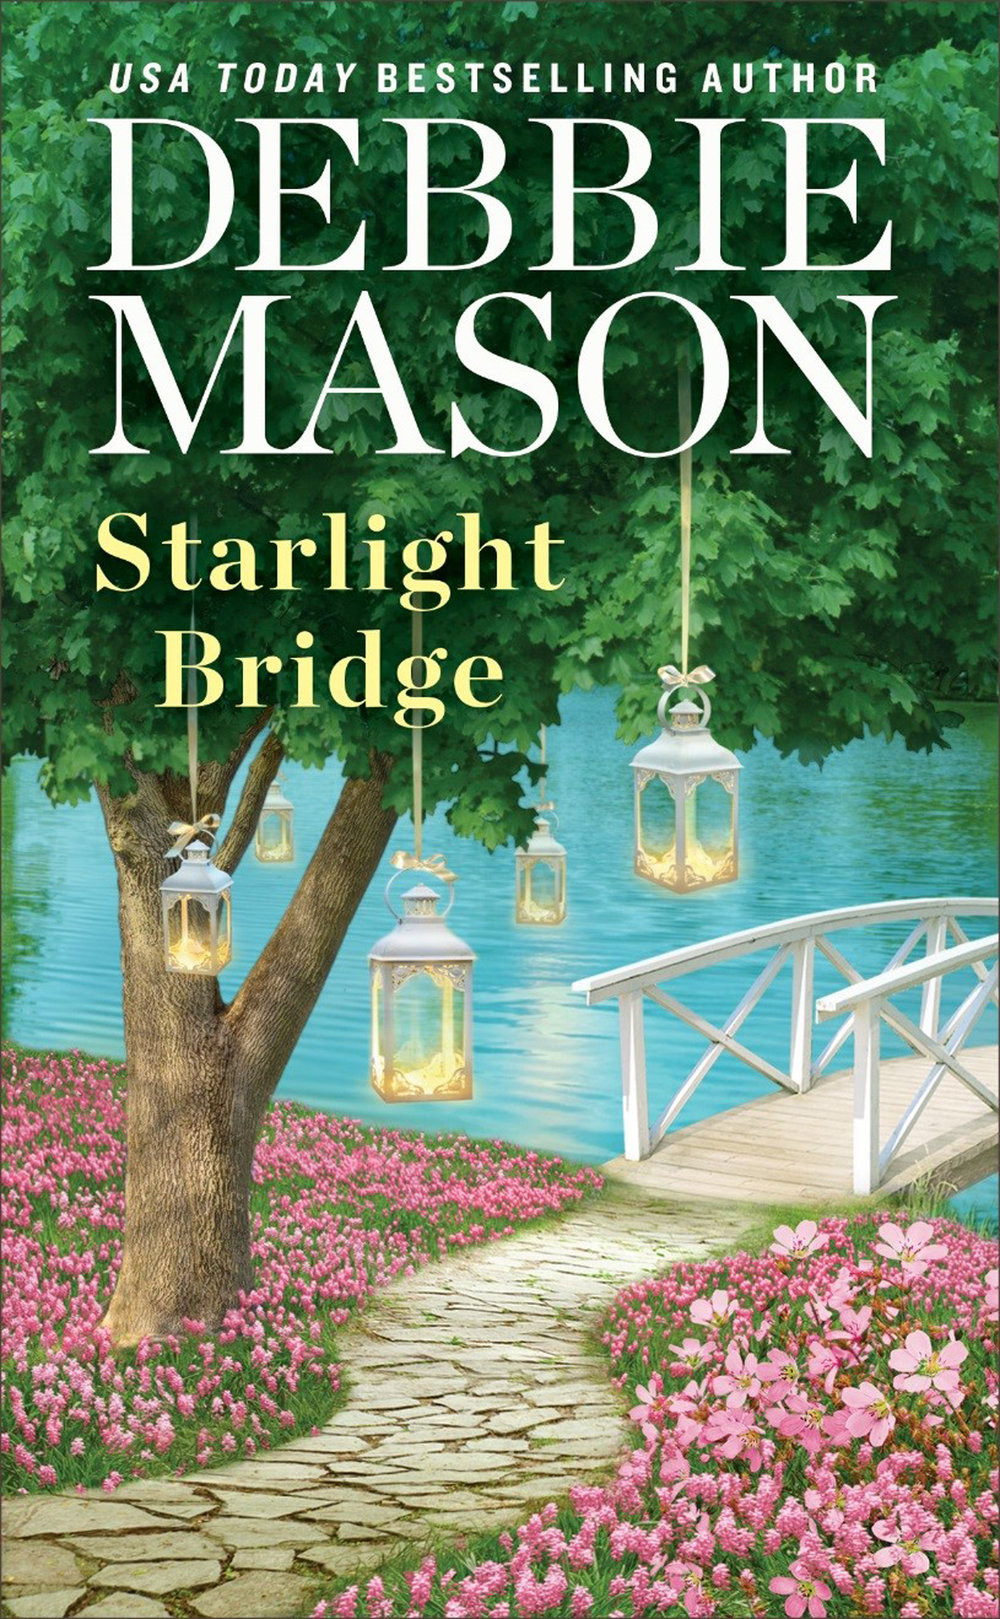 STARLIGHT BRIDGE by Debbie Mason